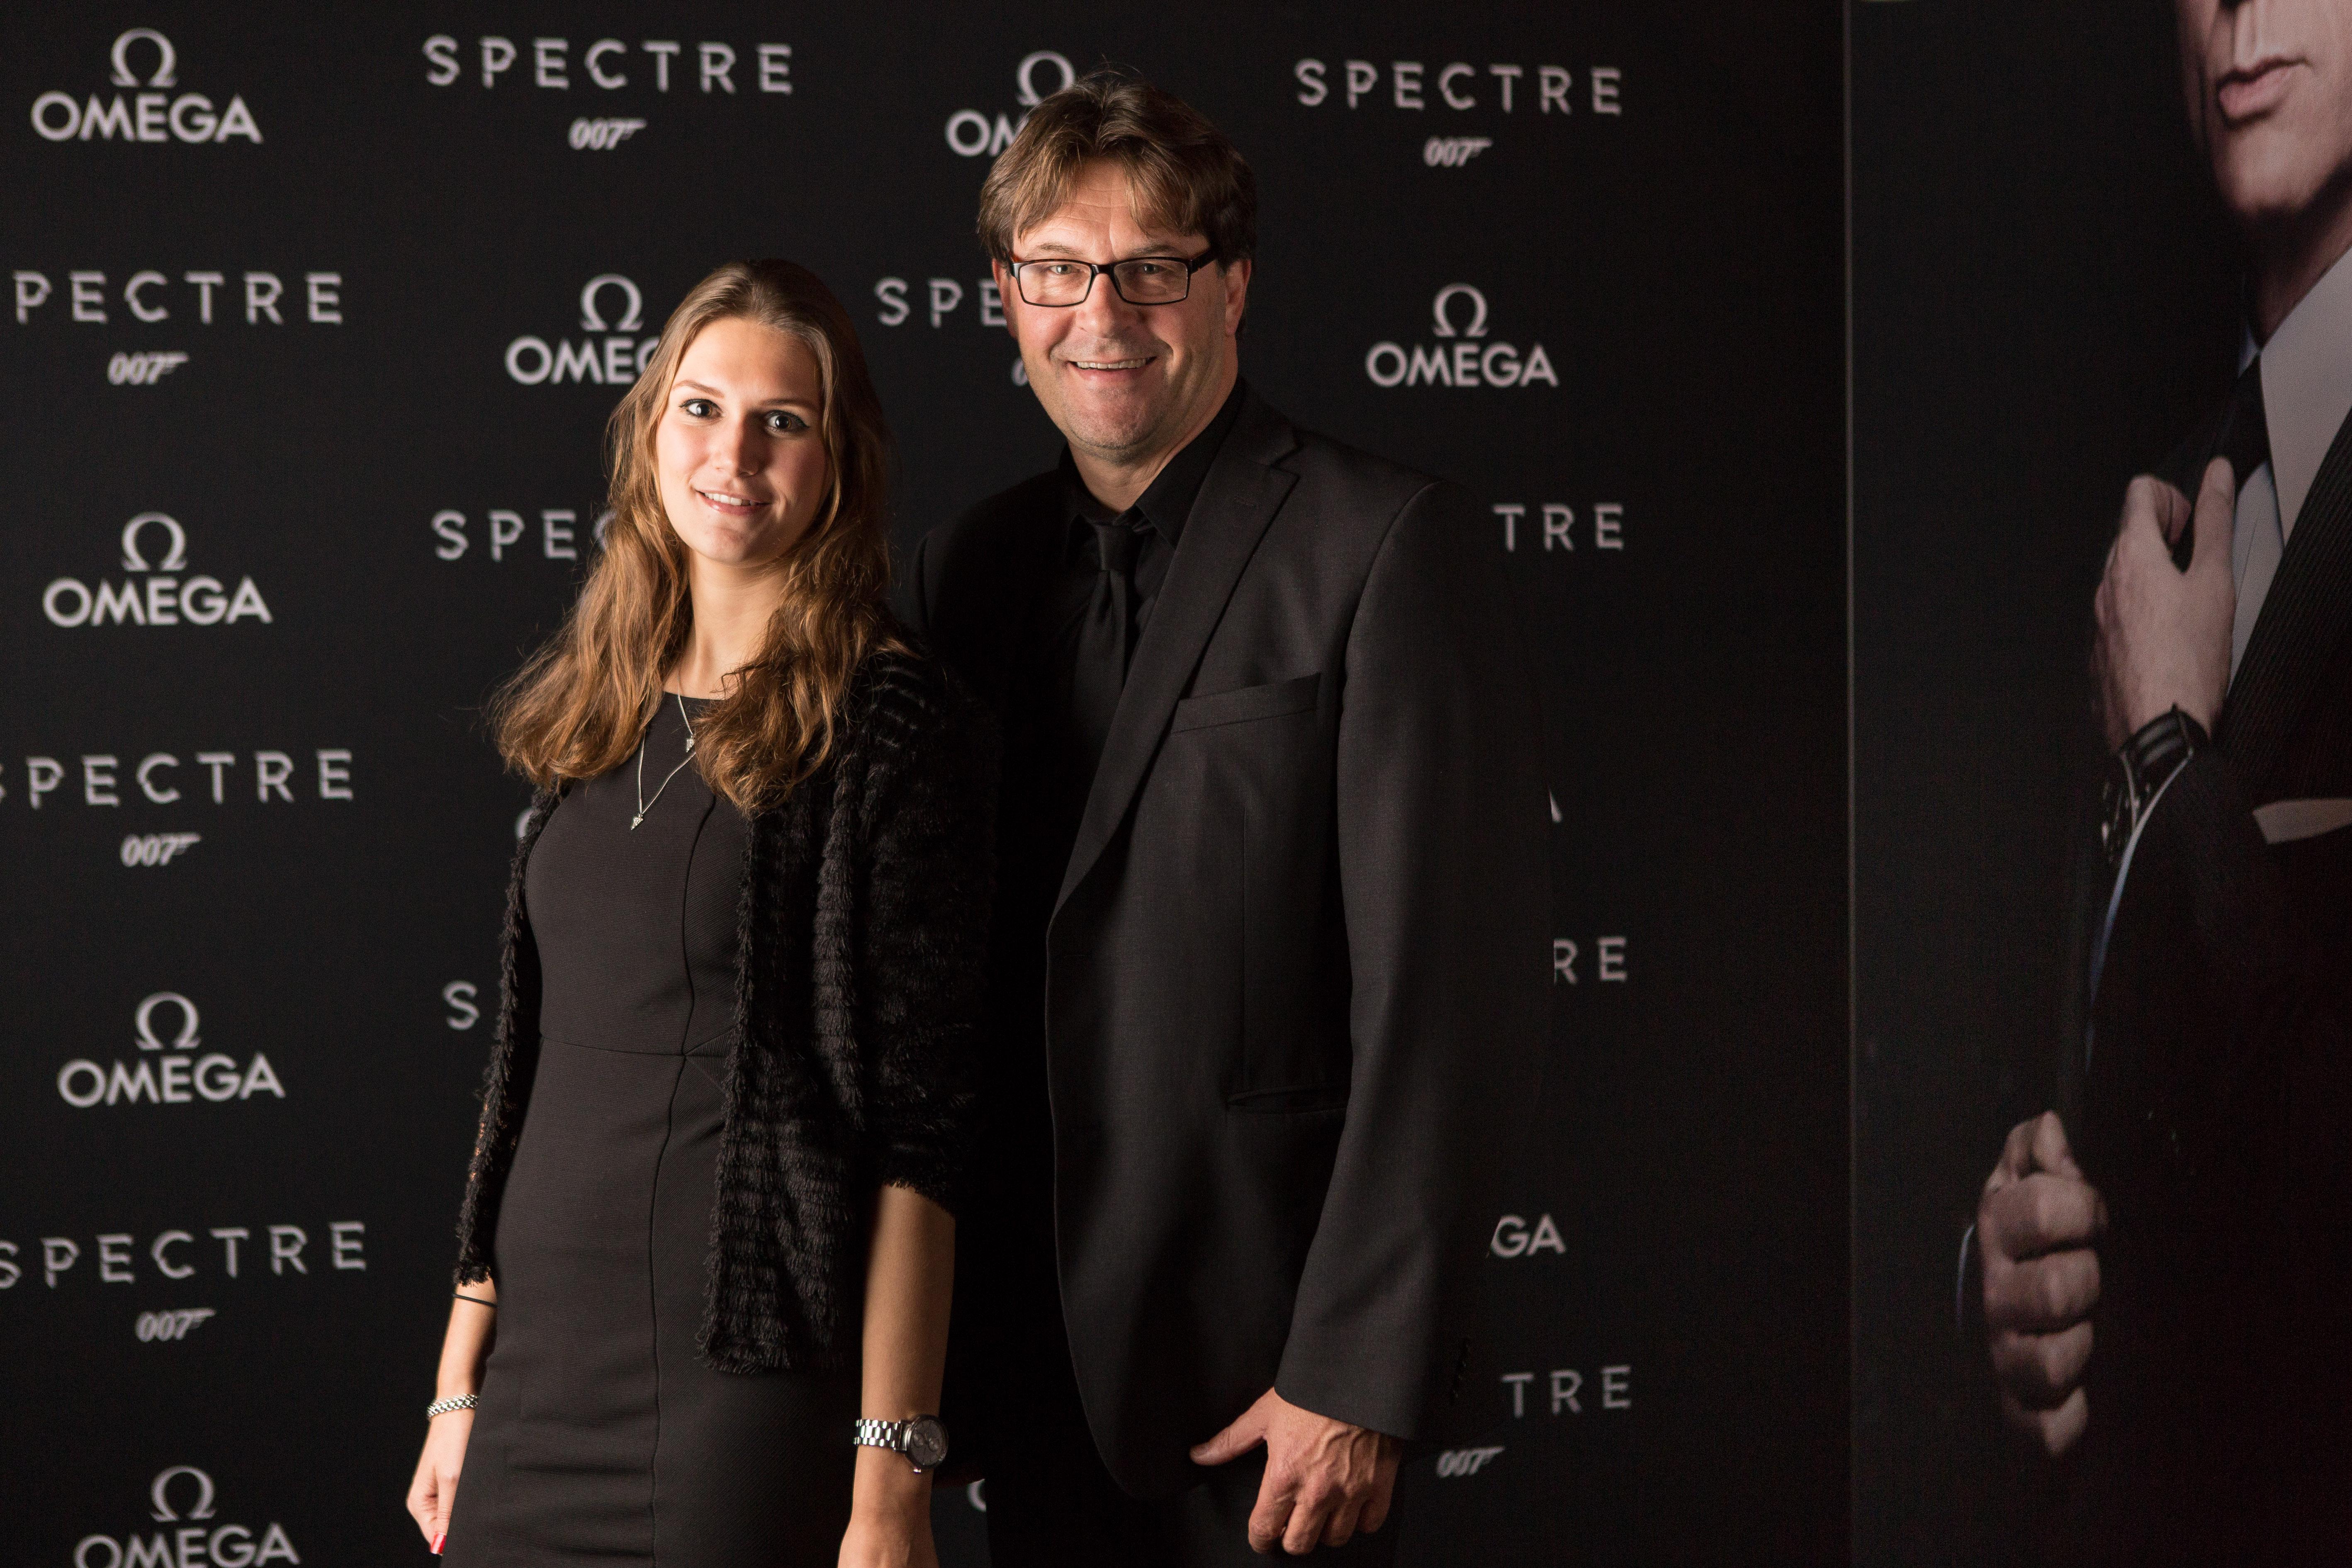 spectre-omega wall-21